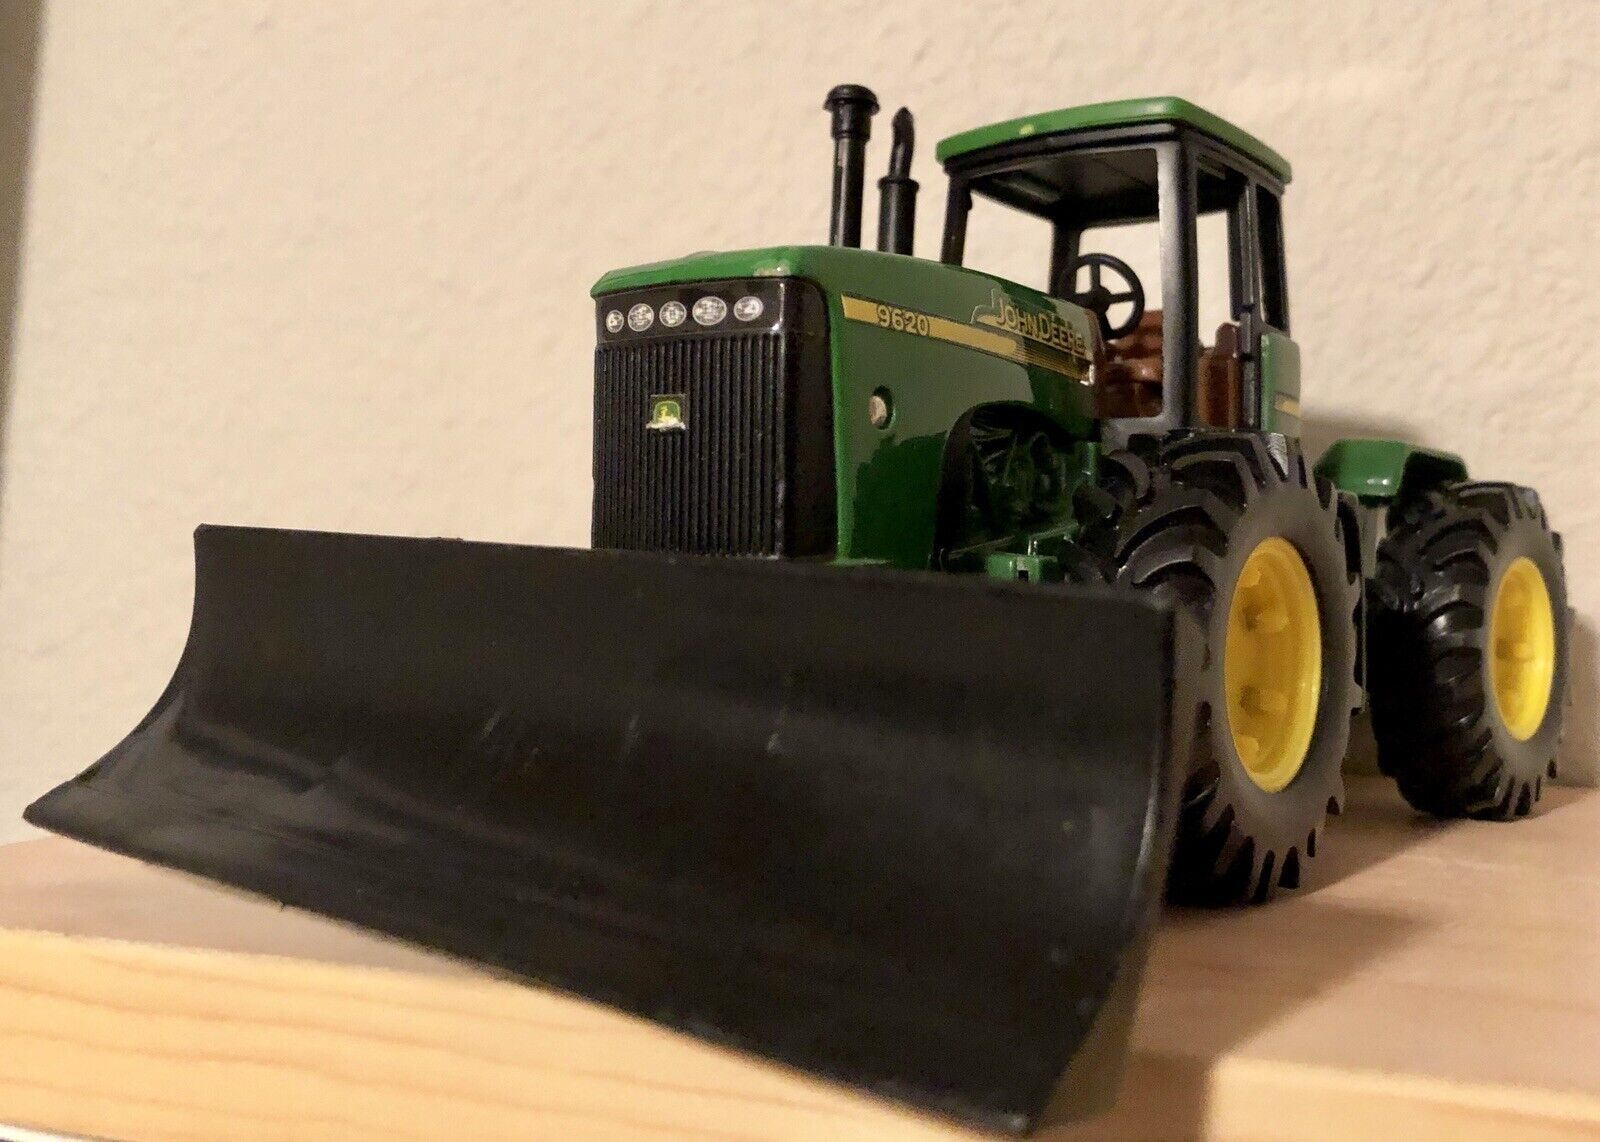 "9"" John Deere Tractor 9620 With Road Scraper Attachment Vintage Farm Diecast Toy"